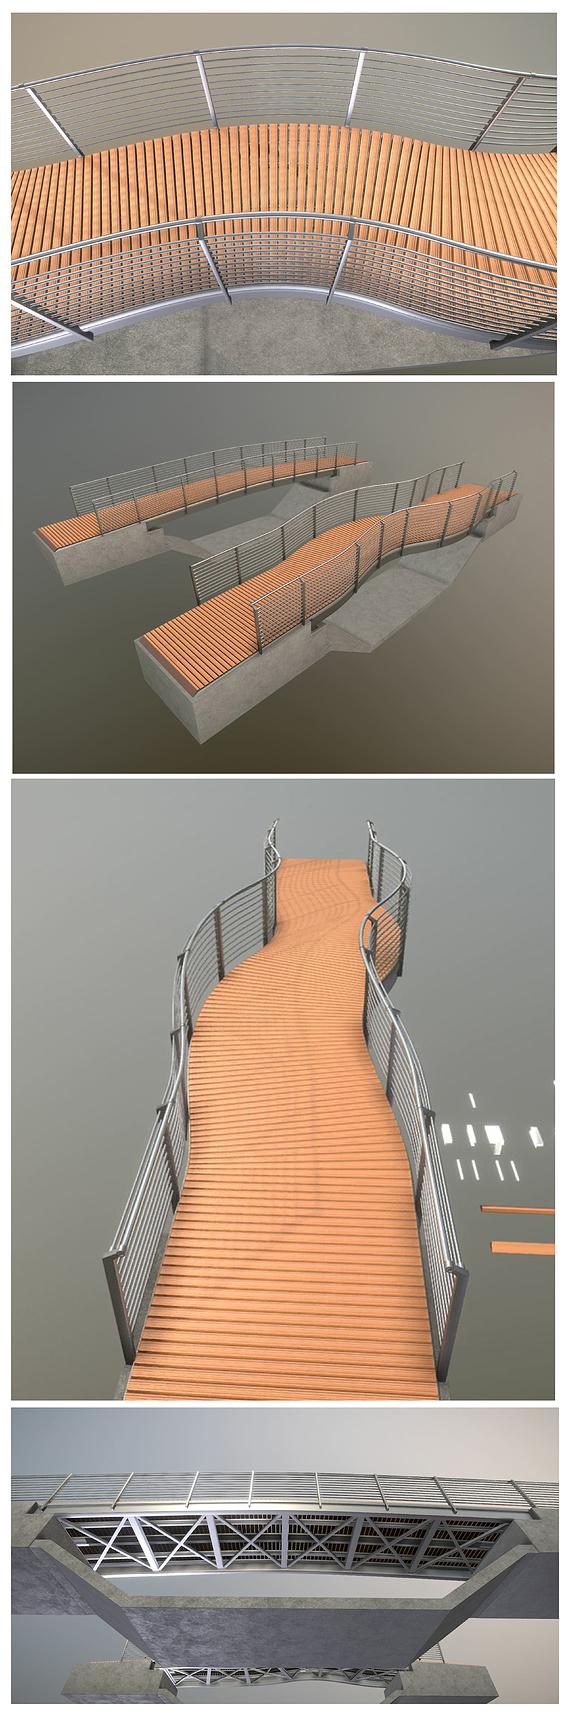 Cycle Bridge - Version 1